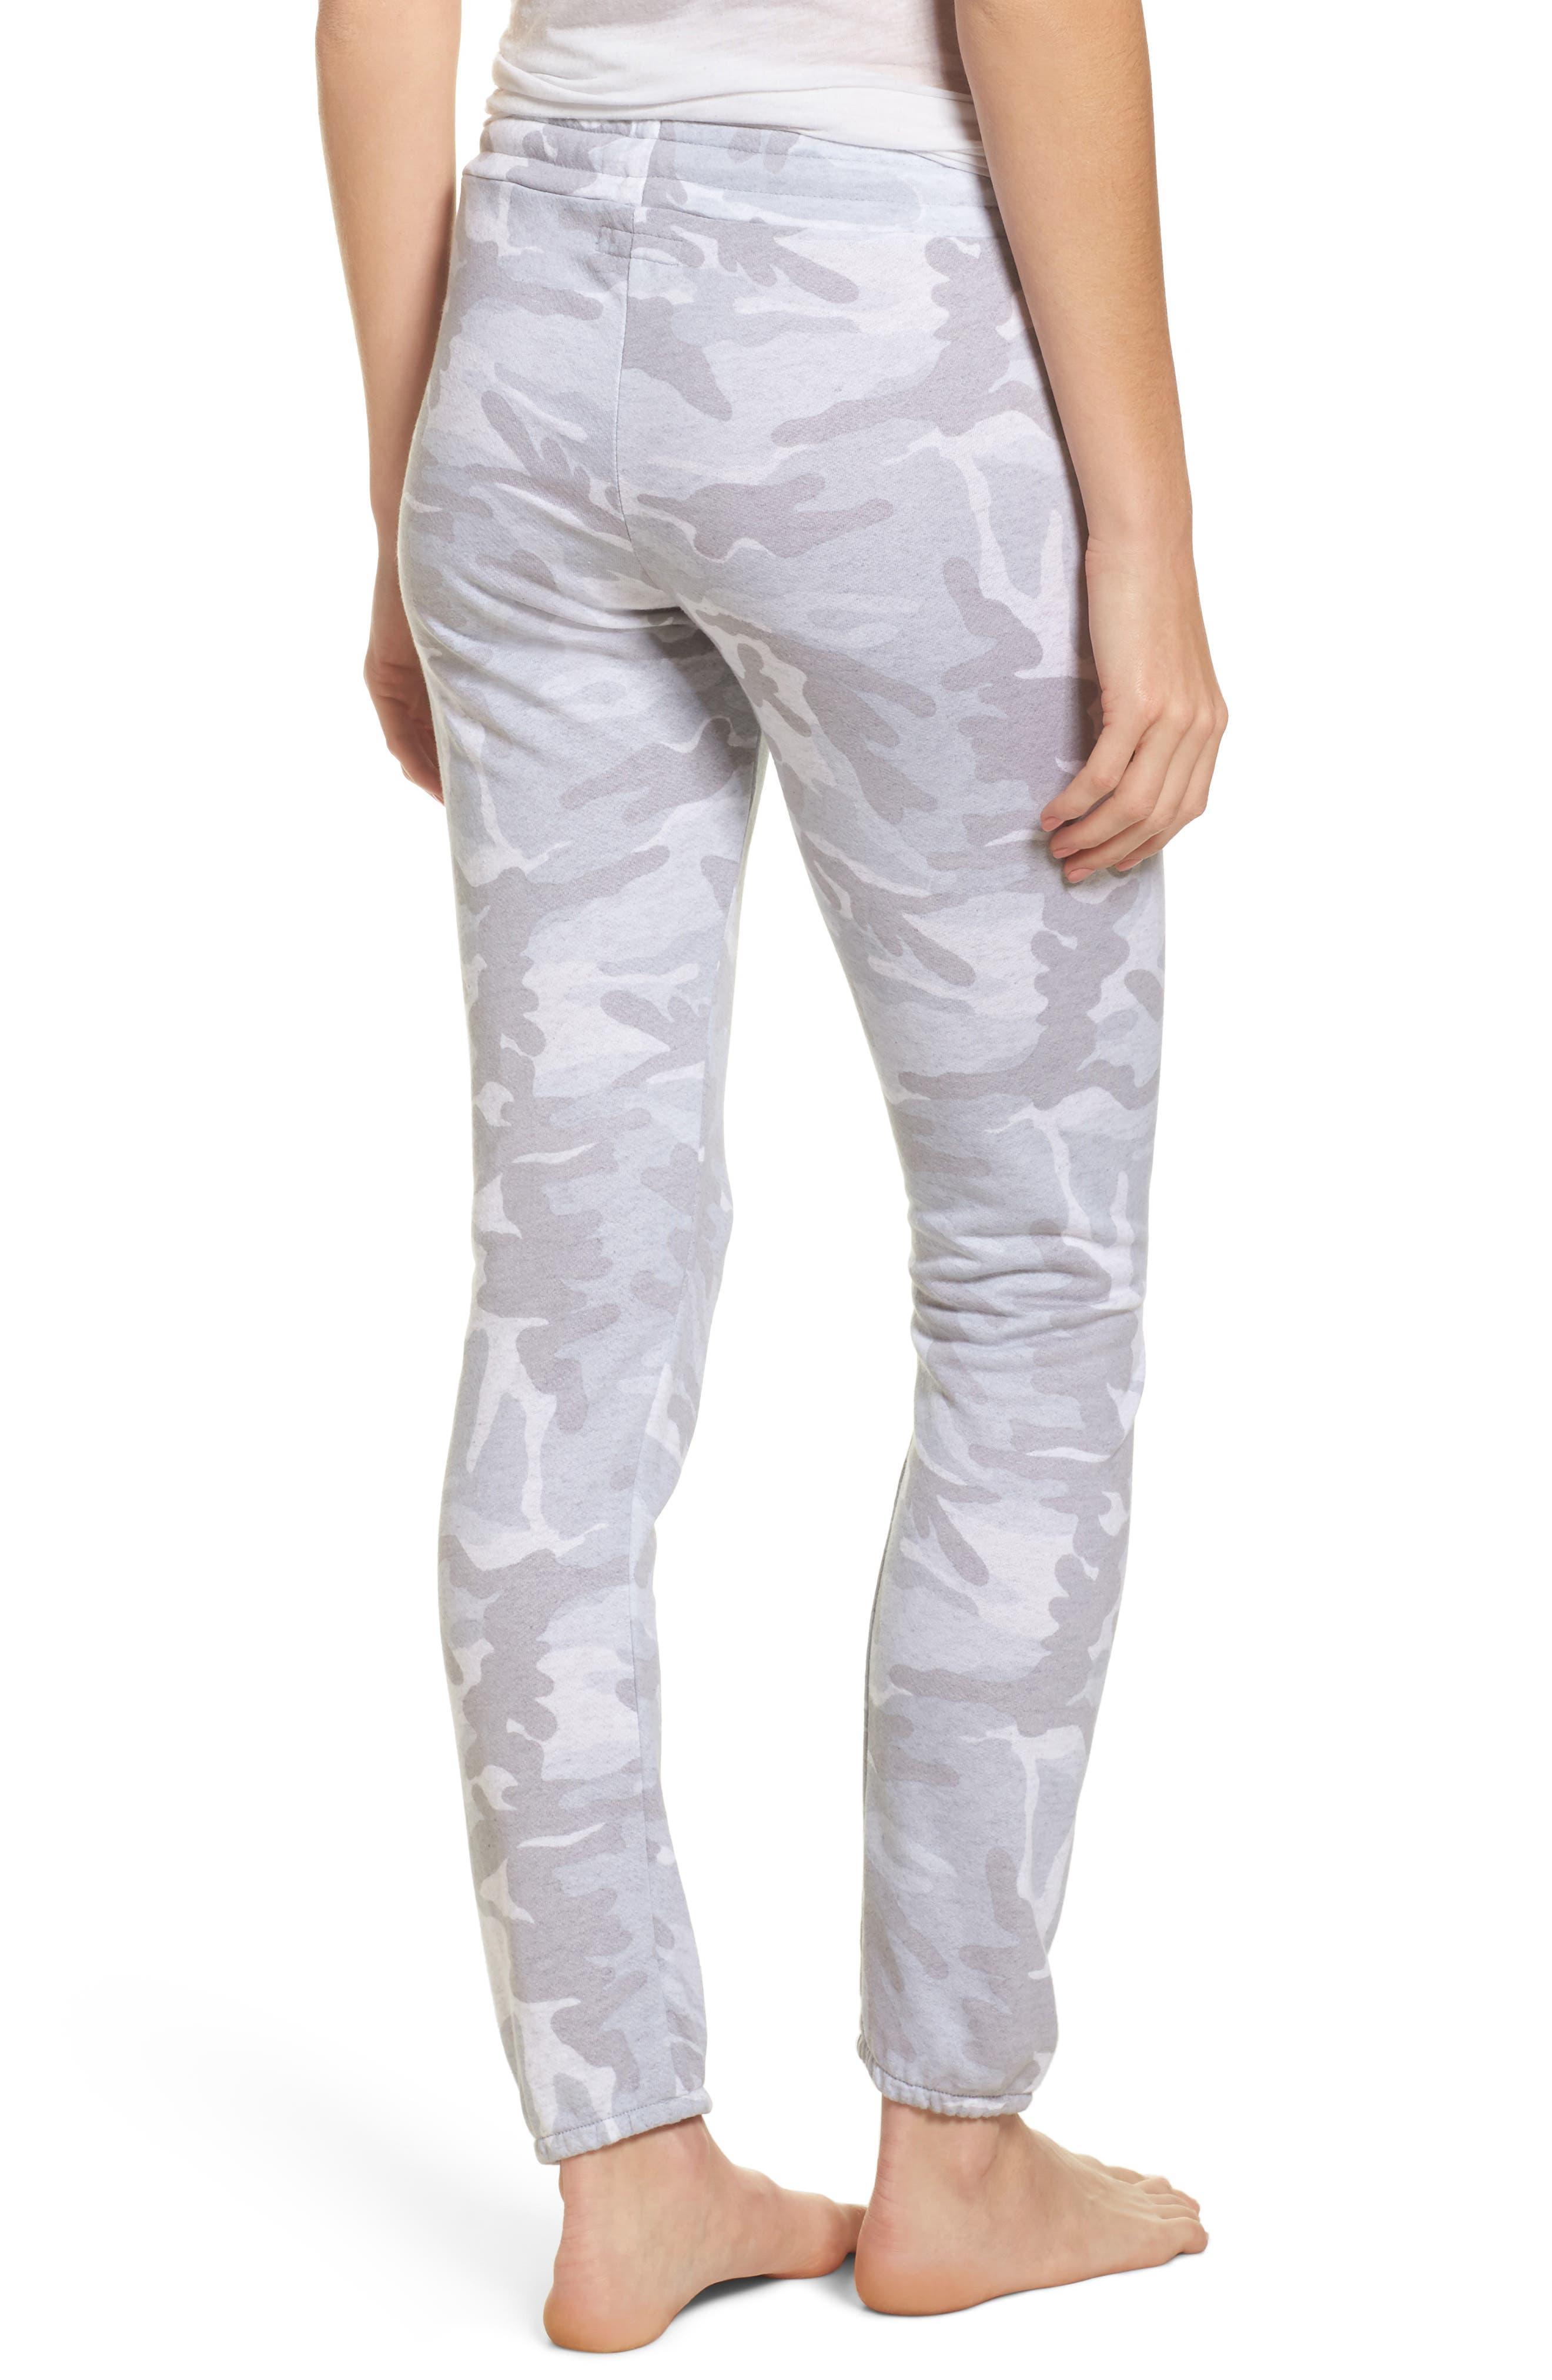 Campbell Vintage Jogger Pants,                             Alternate thumbnail 2, color,                             Light Grey Camo